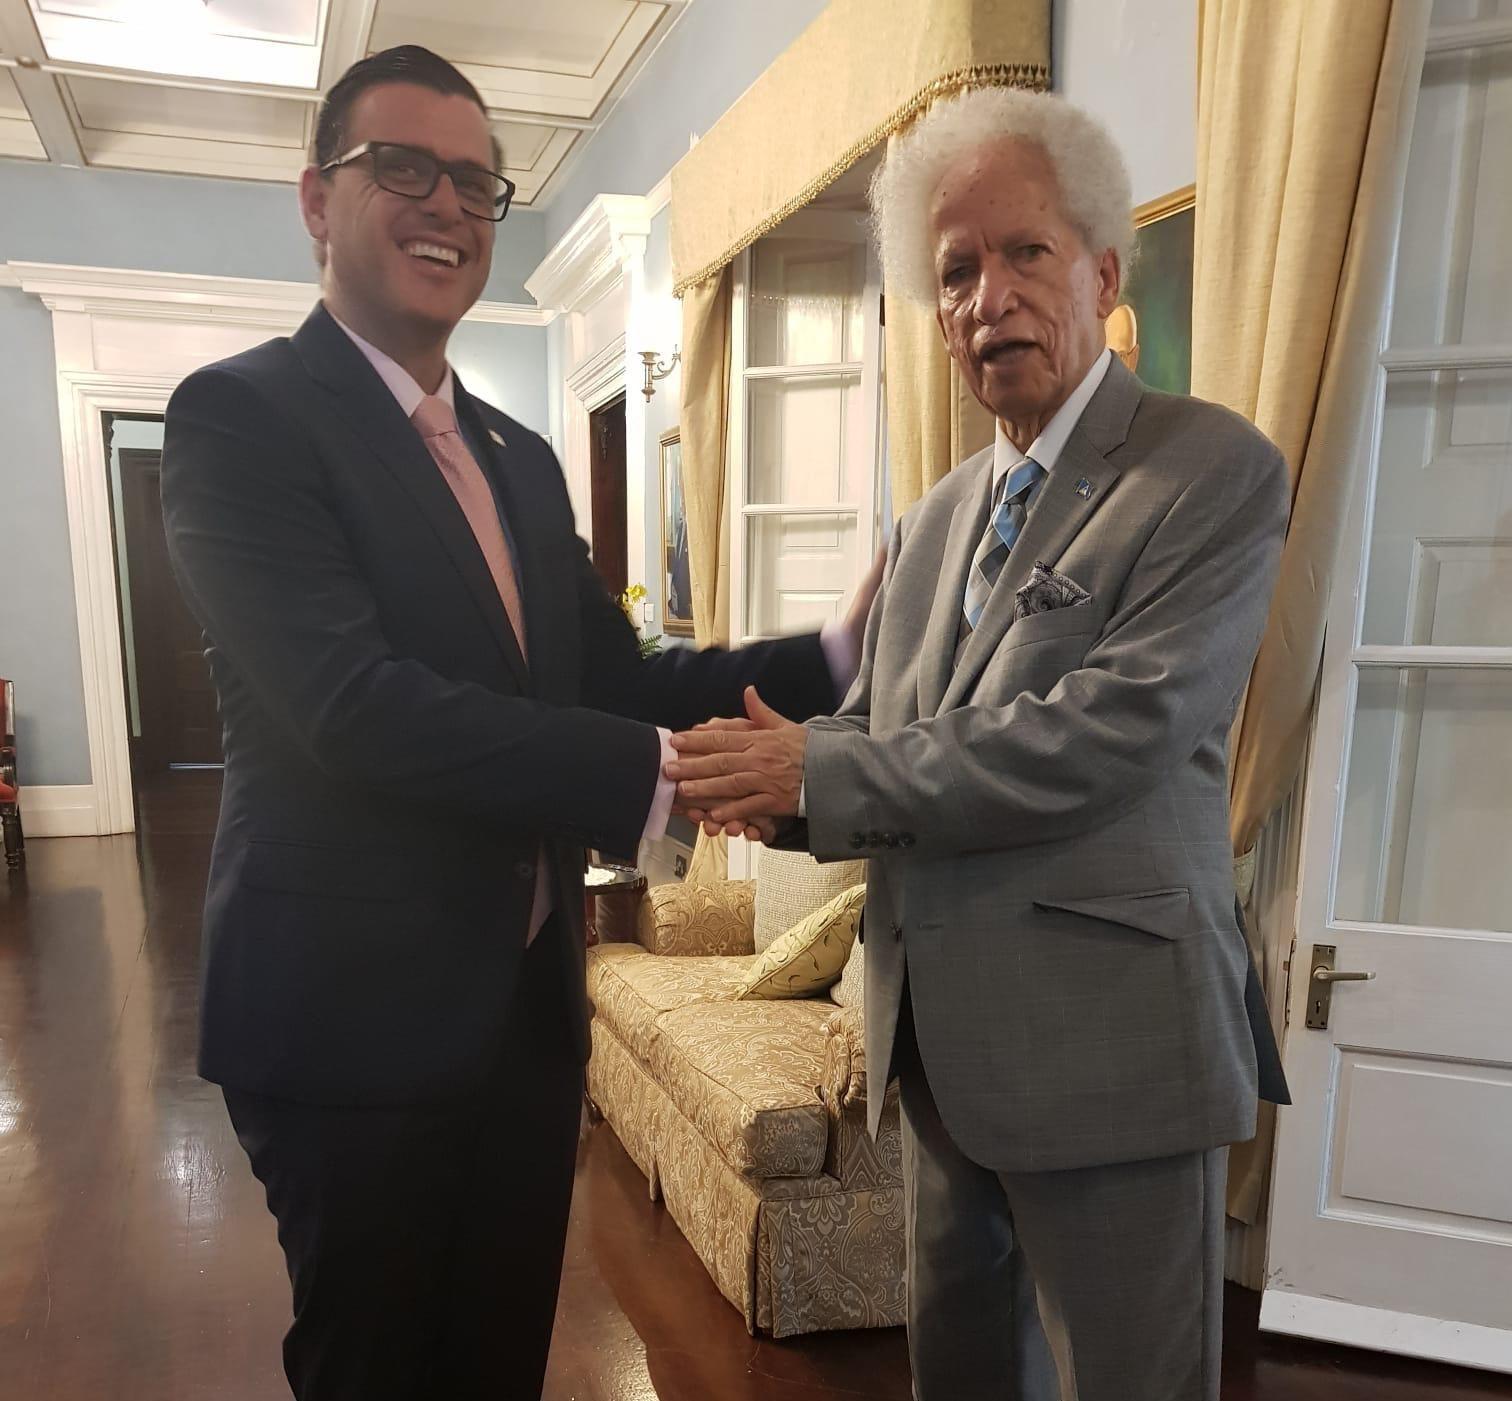 Reunion-con-el-Gobernador-General-e1573651177686.jpeg